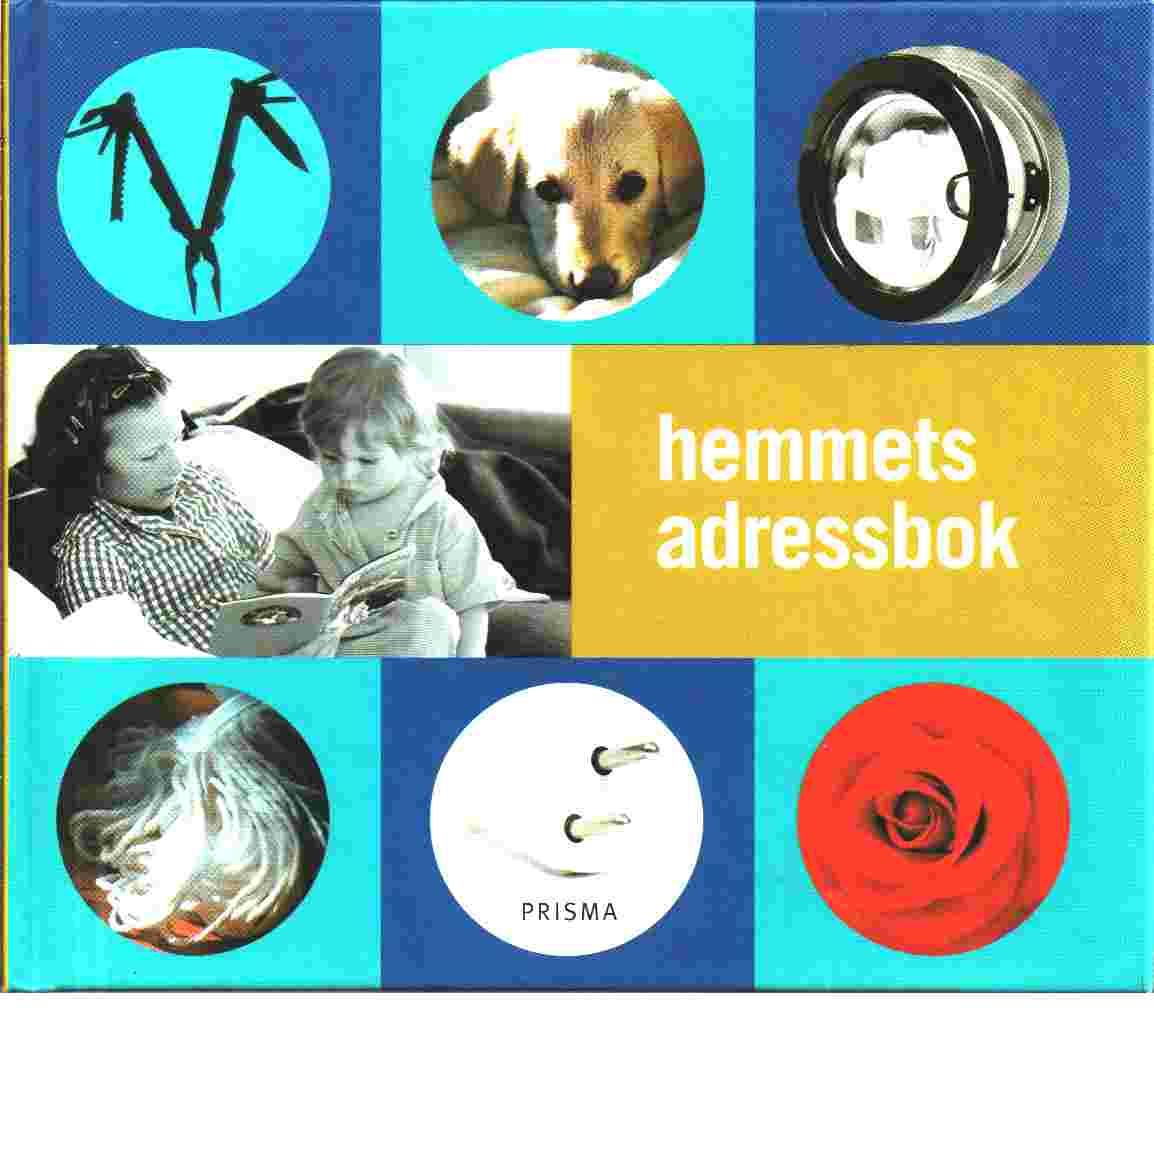 Hemmets adressbok - Wellton, Lotte